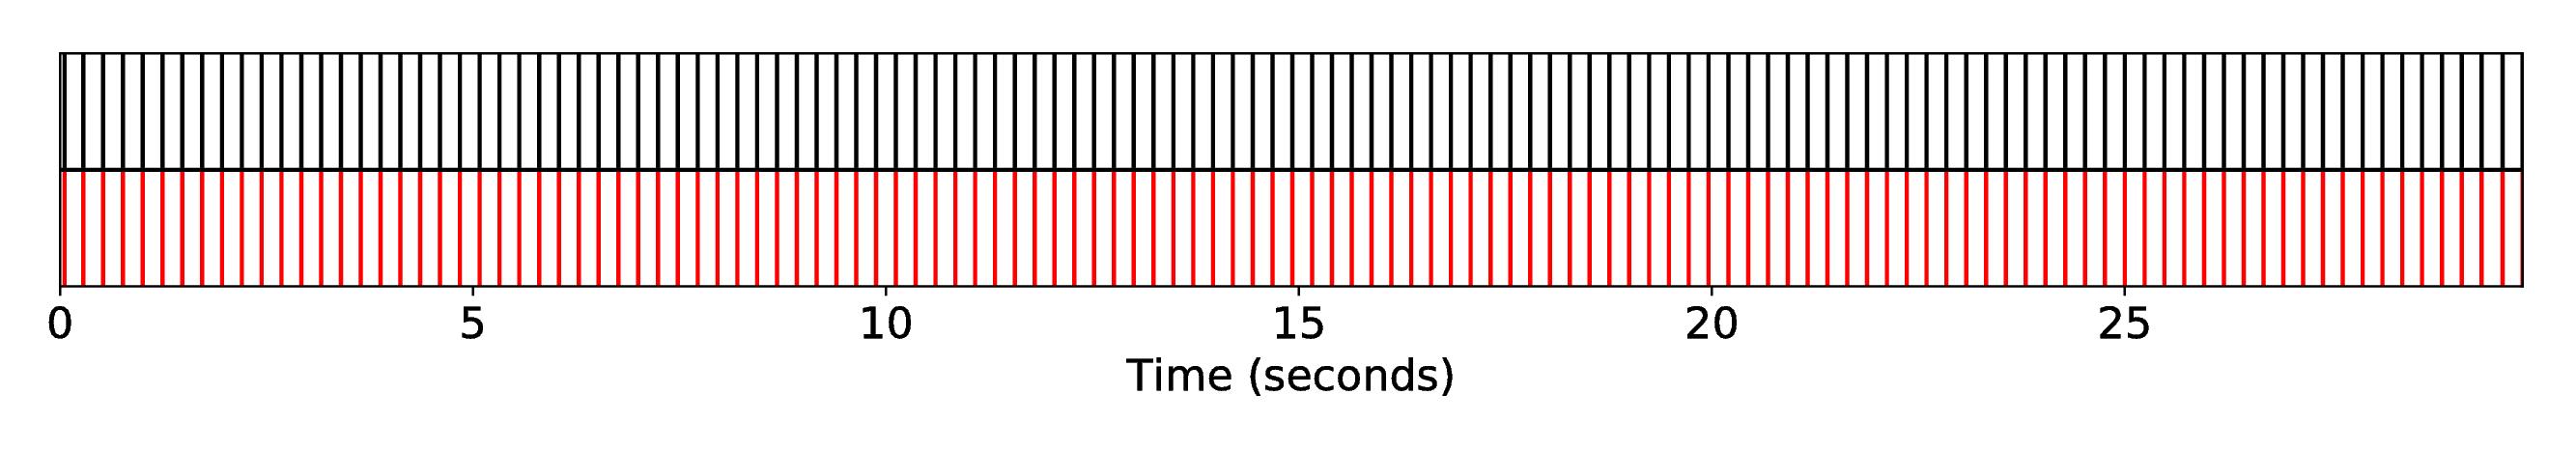 DP1_INT1_R-MRI-12__S-Silence__SequenceAlignment